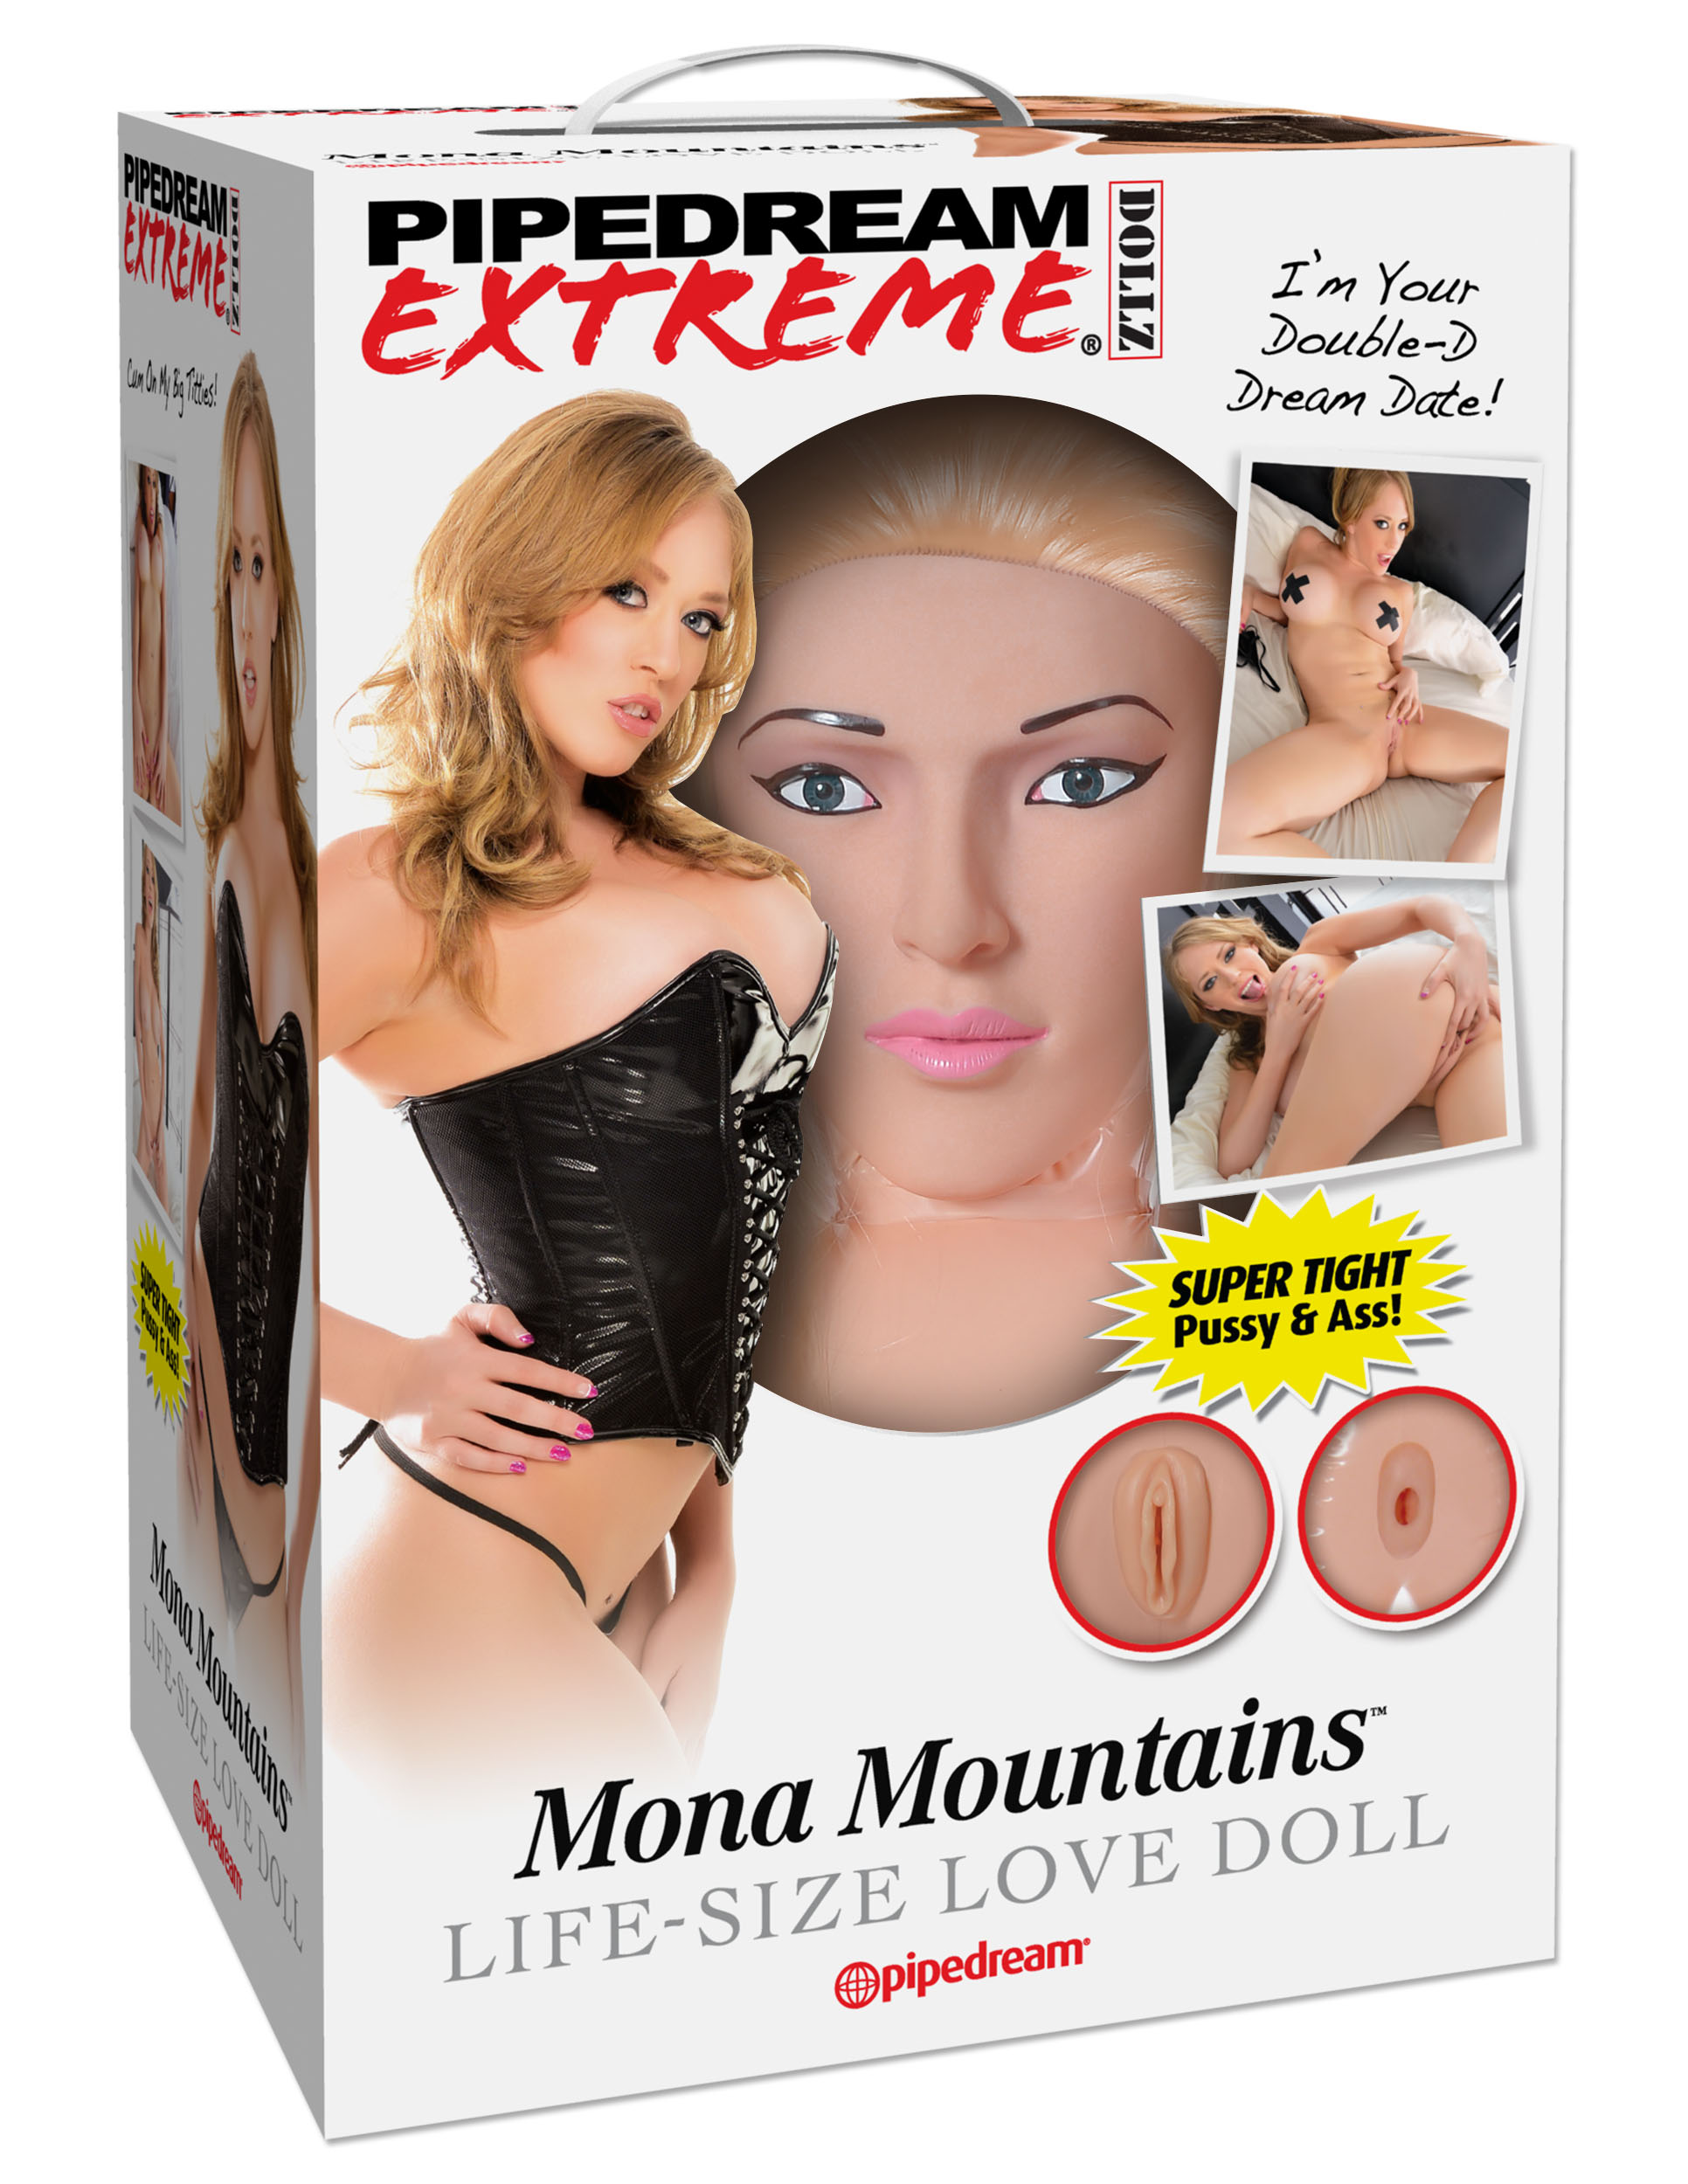 Mona Mountains Love Doll